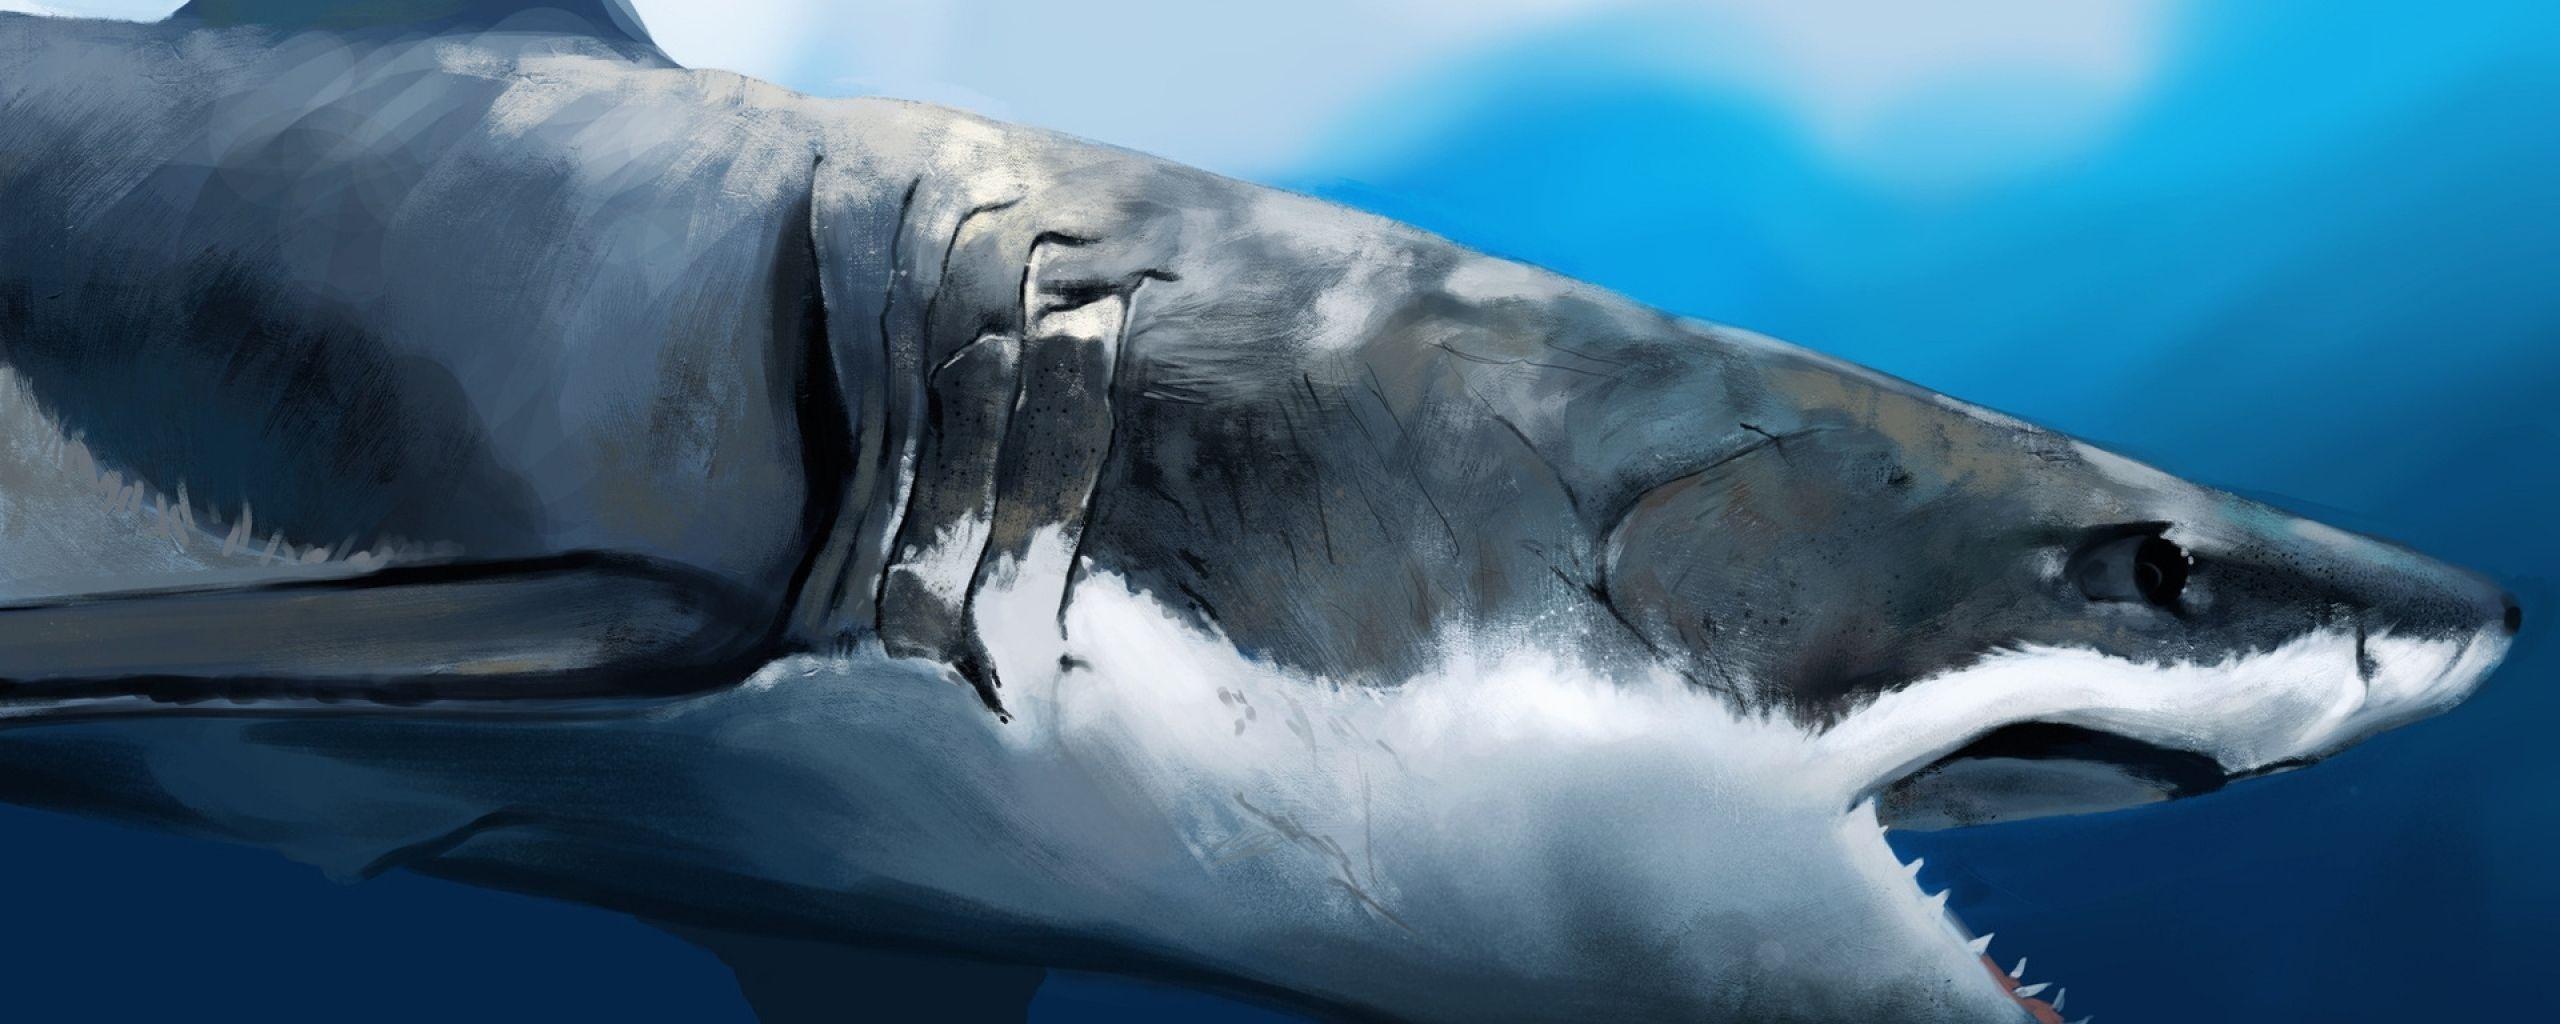 Shark Wallpaper Deep Ocean Shark Wallpaper Gallery Wallpapers 4k